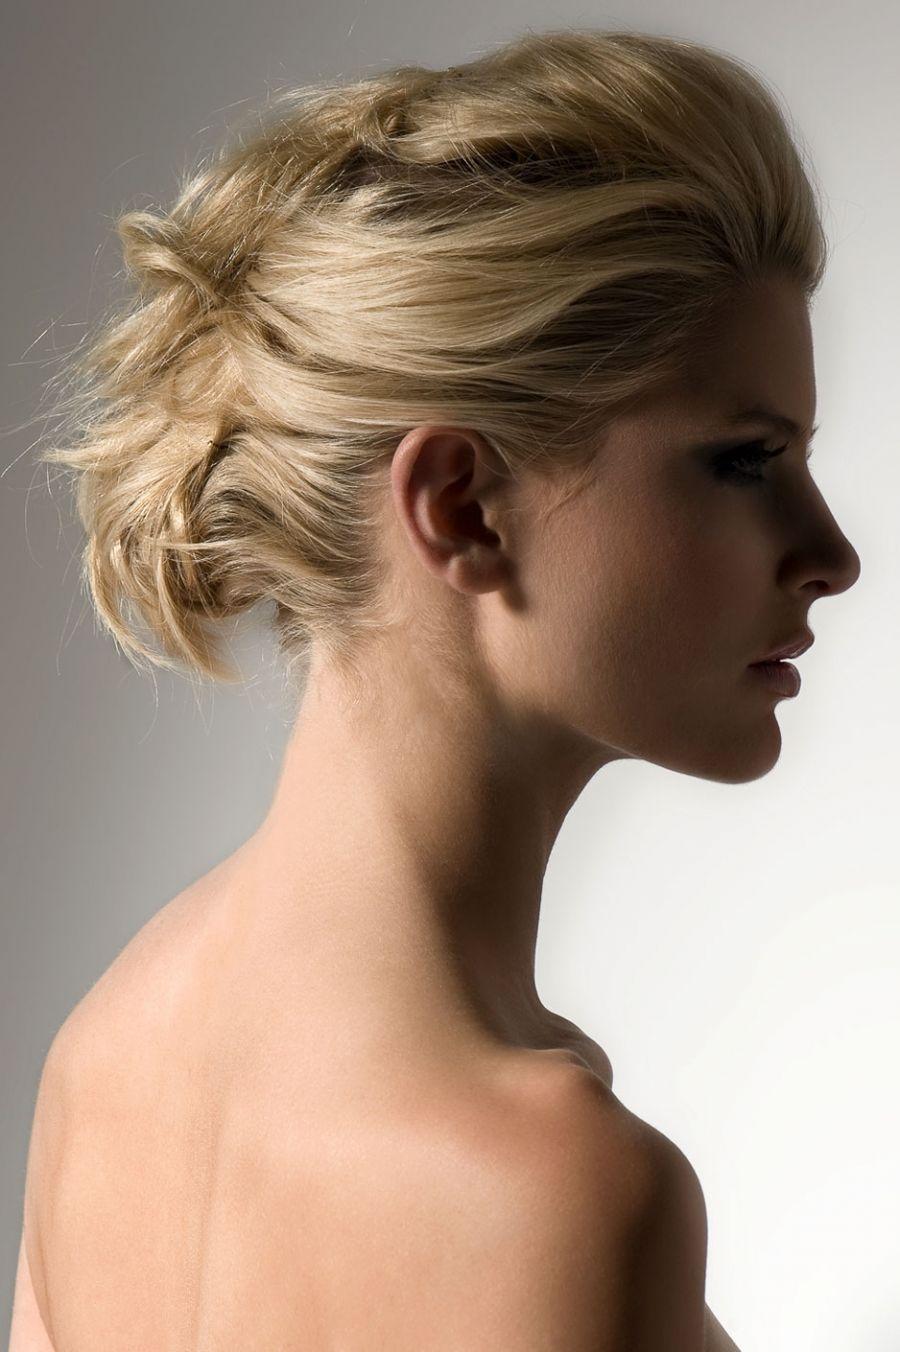 Peachy Easy Hairstyles For Medium Length Hair Updo Best Layered Short Hairstyles For Black Women Fulllsitofus